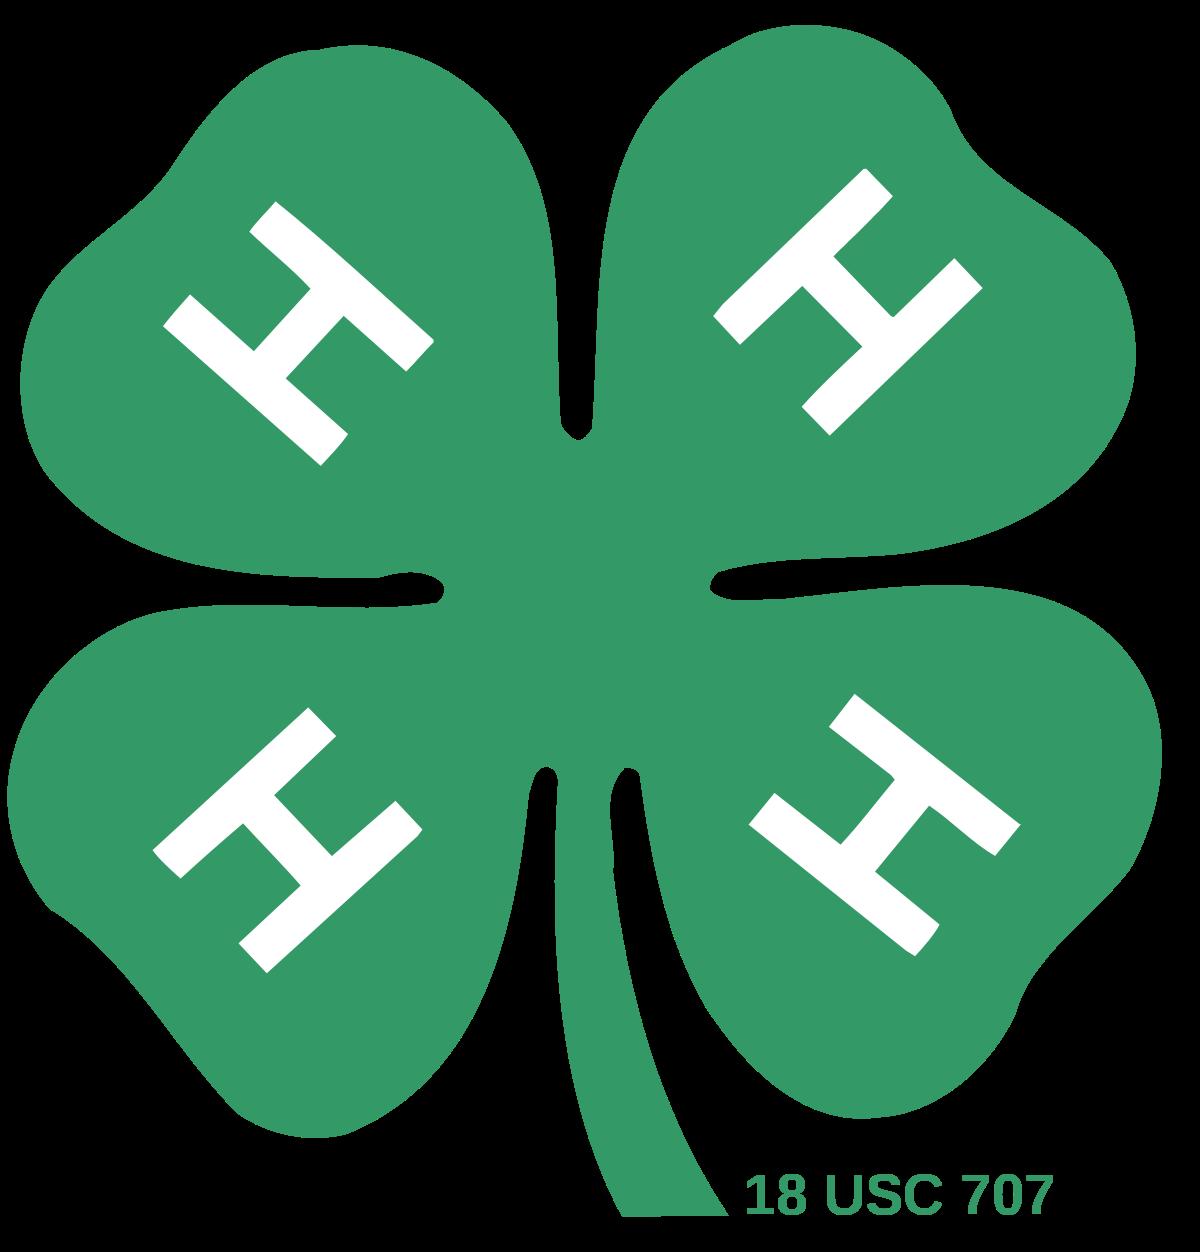 4-H logo national 4H council